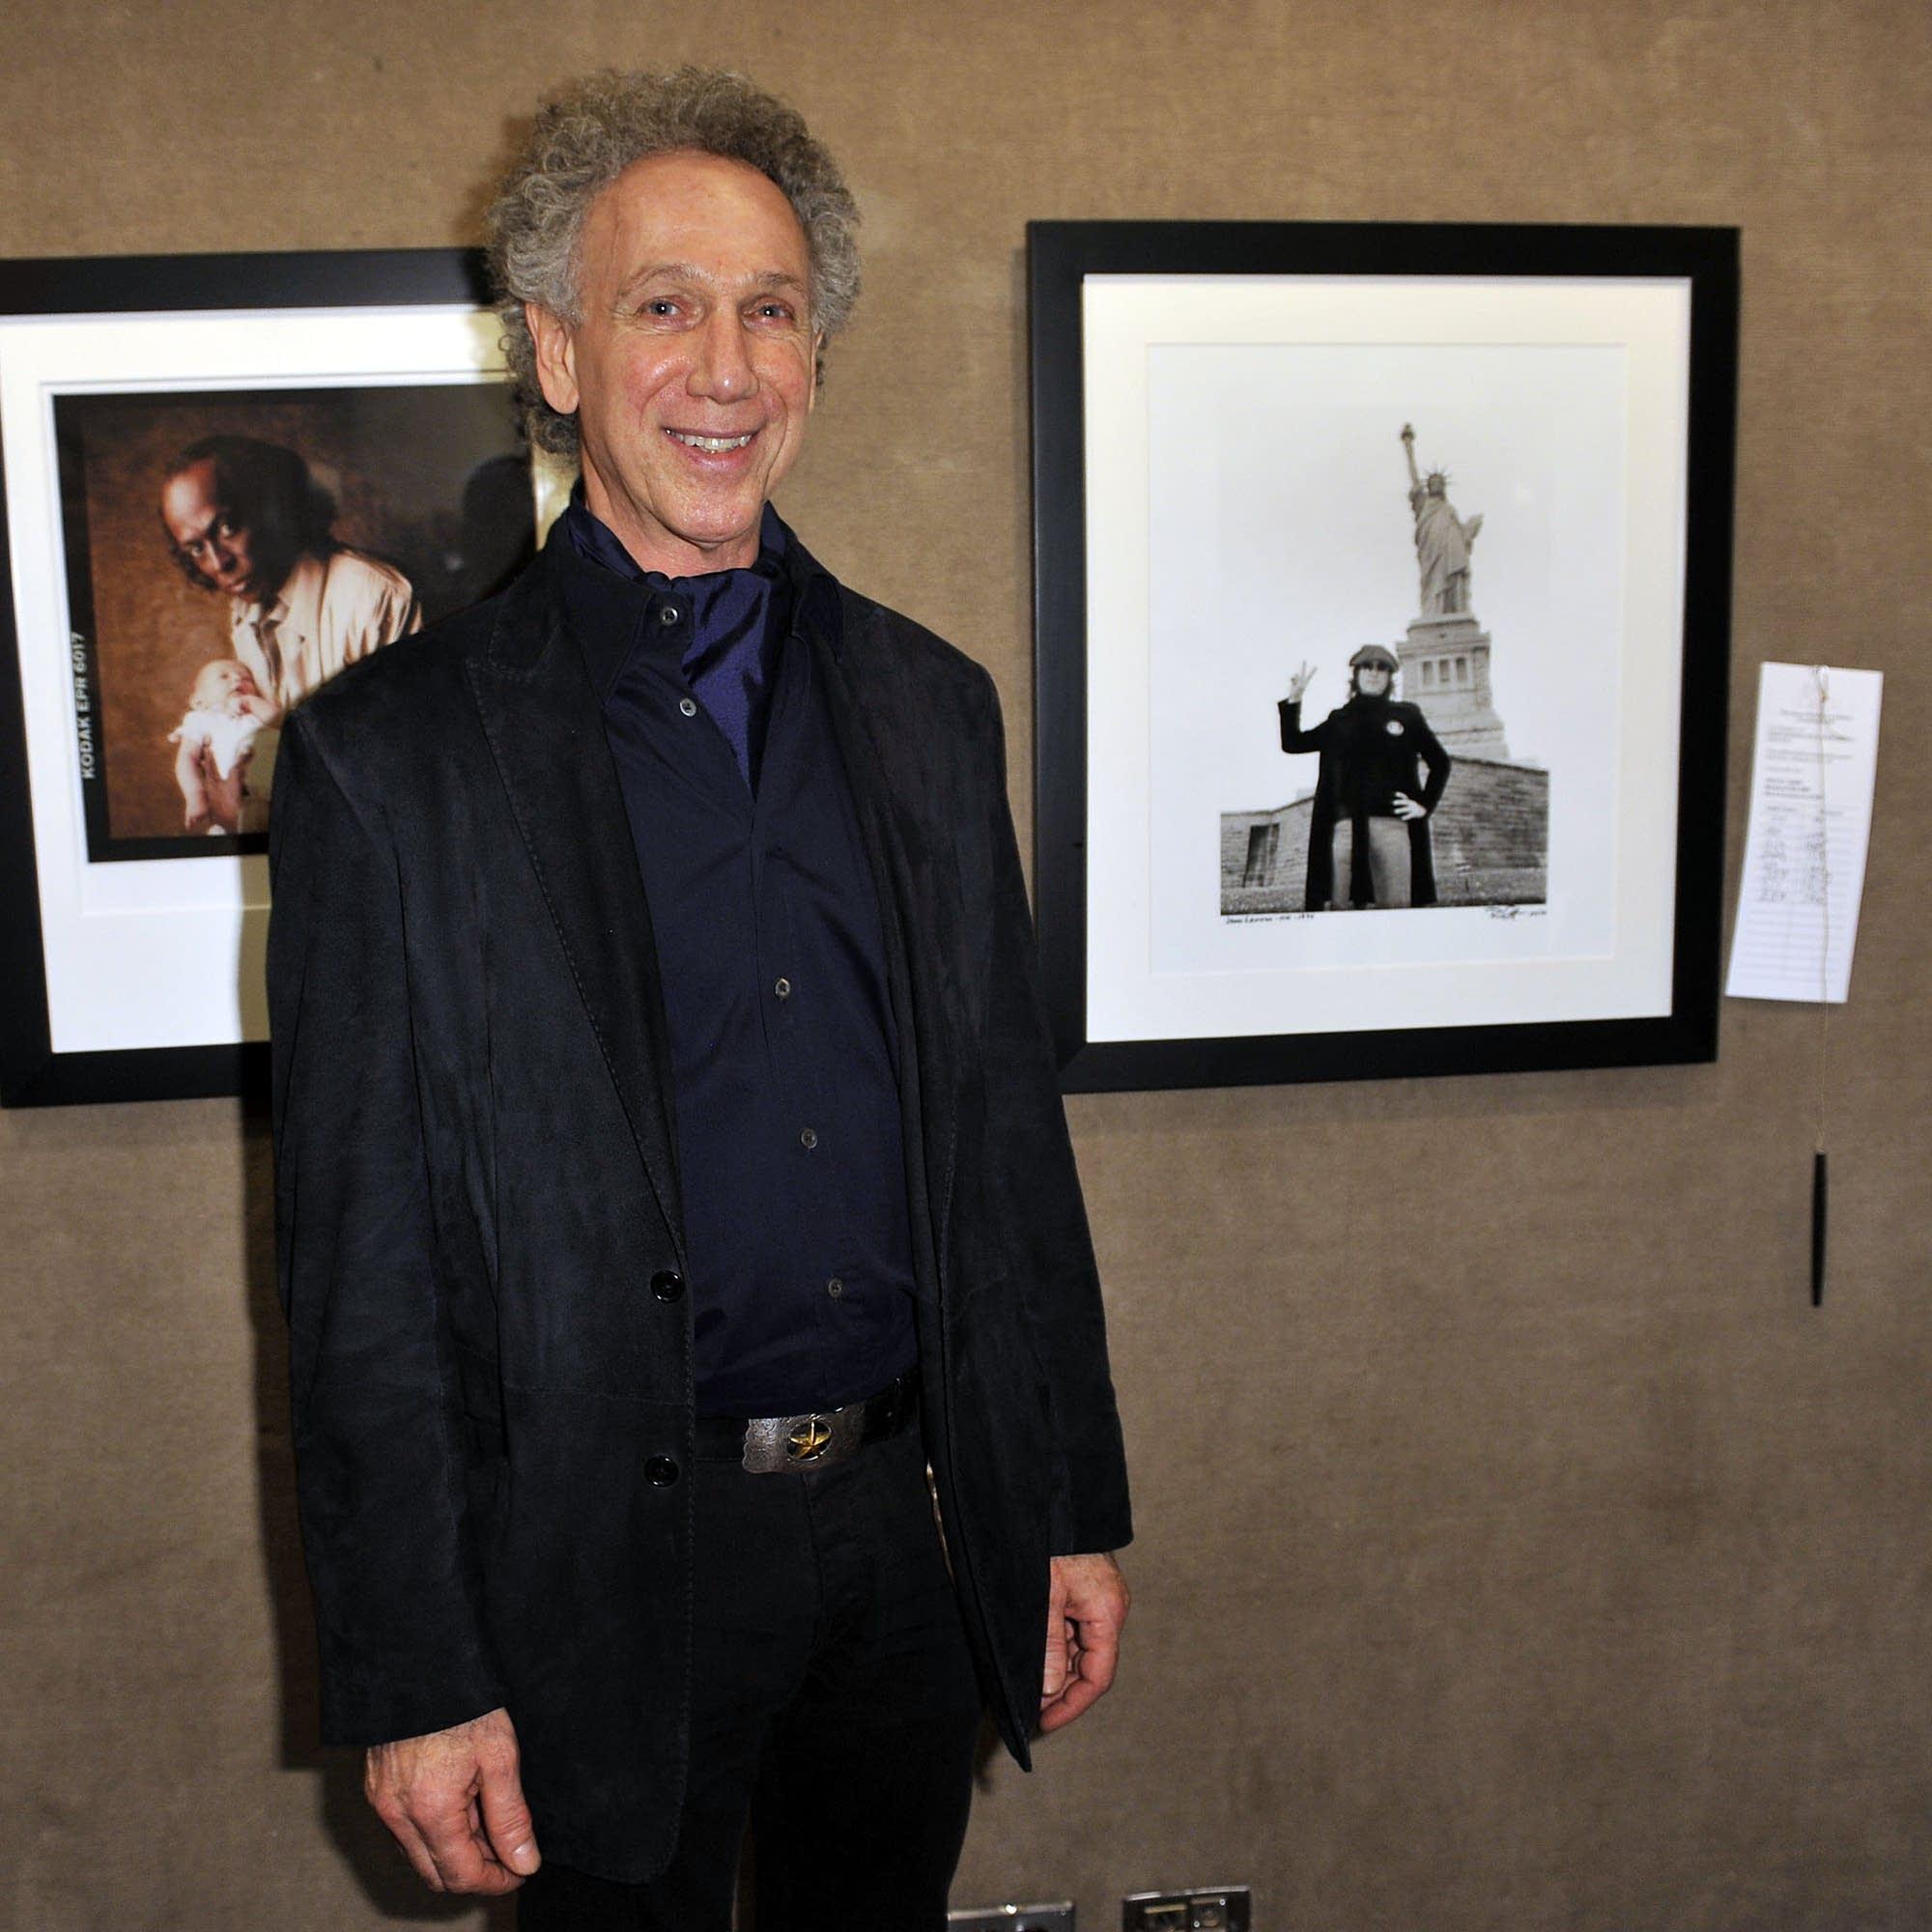 Photographer Bob Gruen